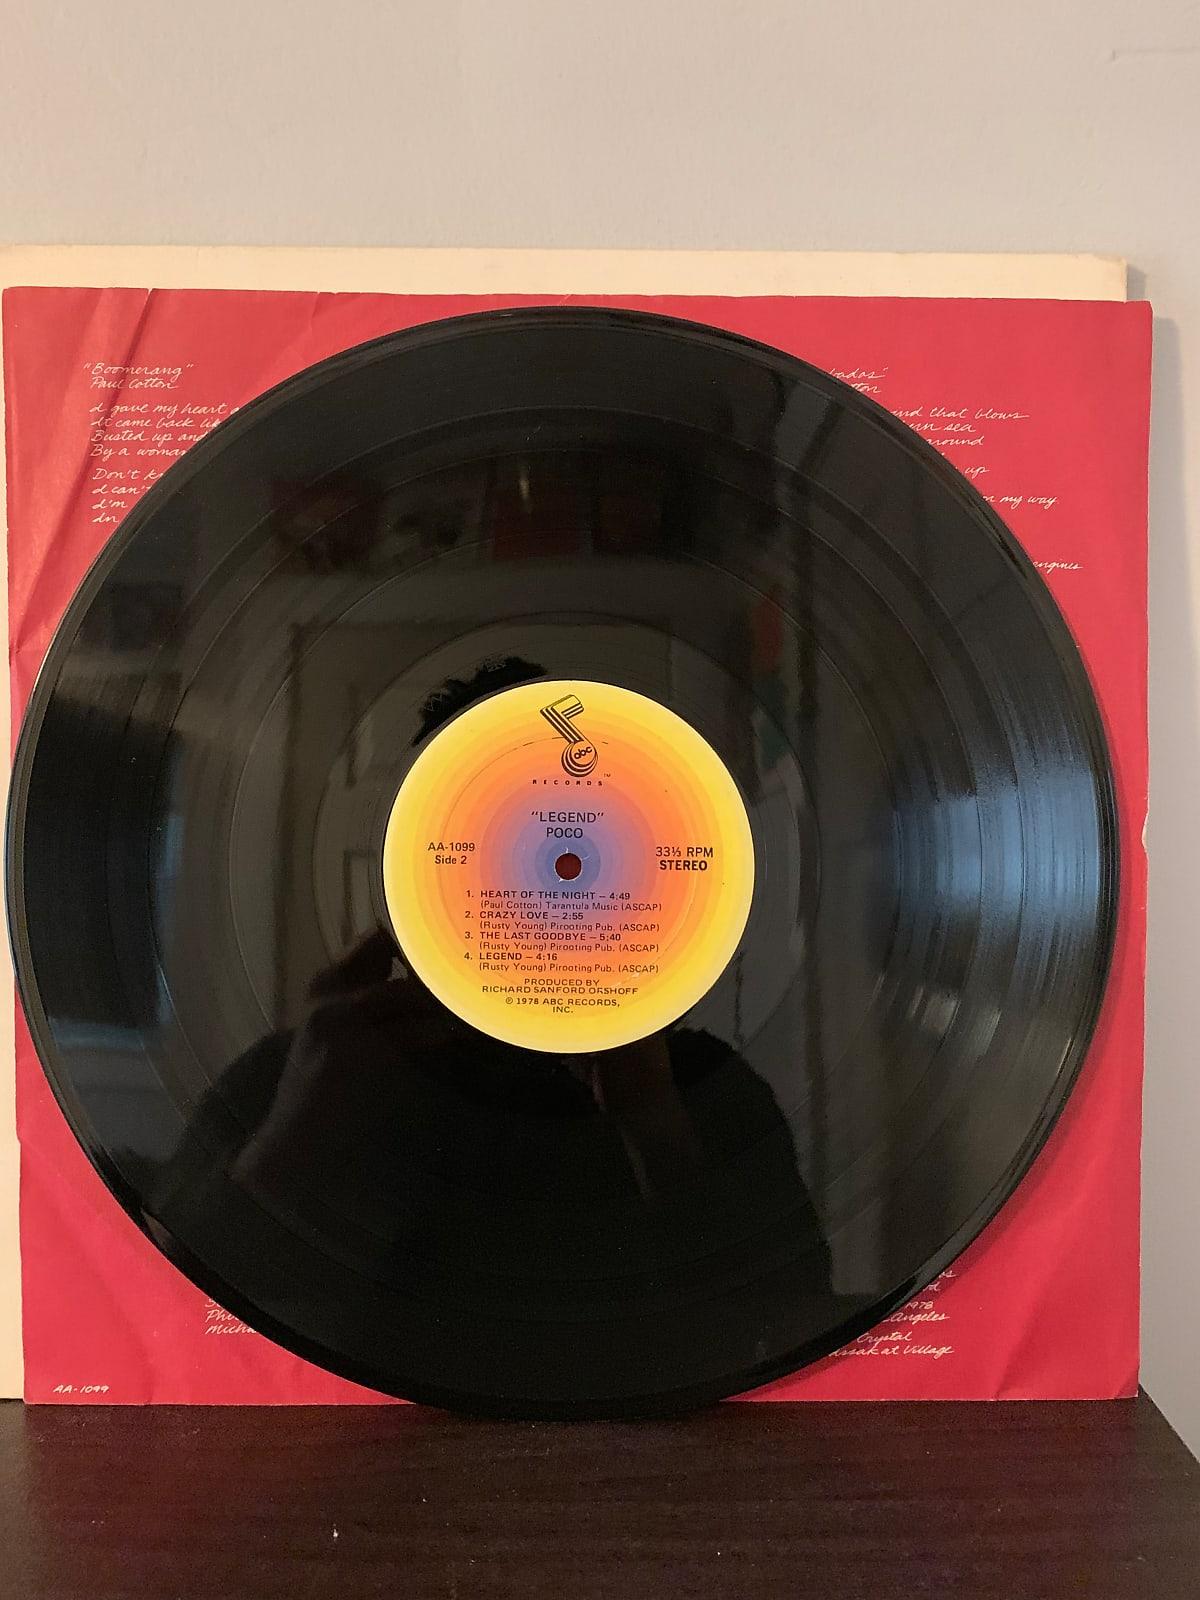 Poco (3) - Legend - Vinyl